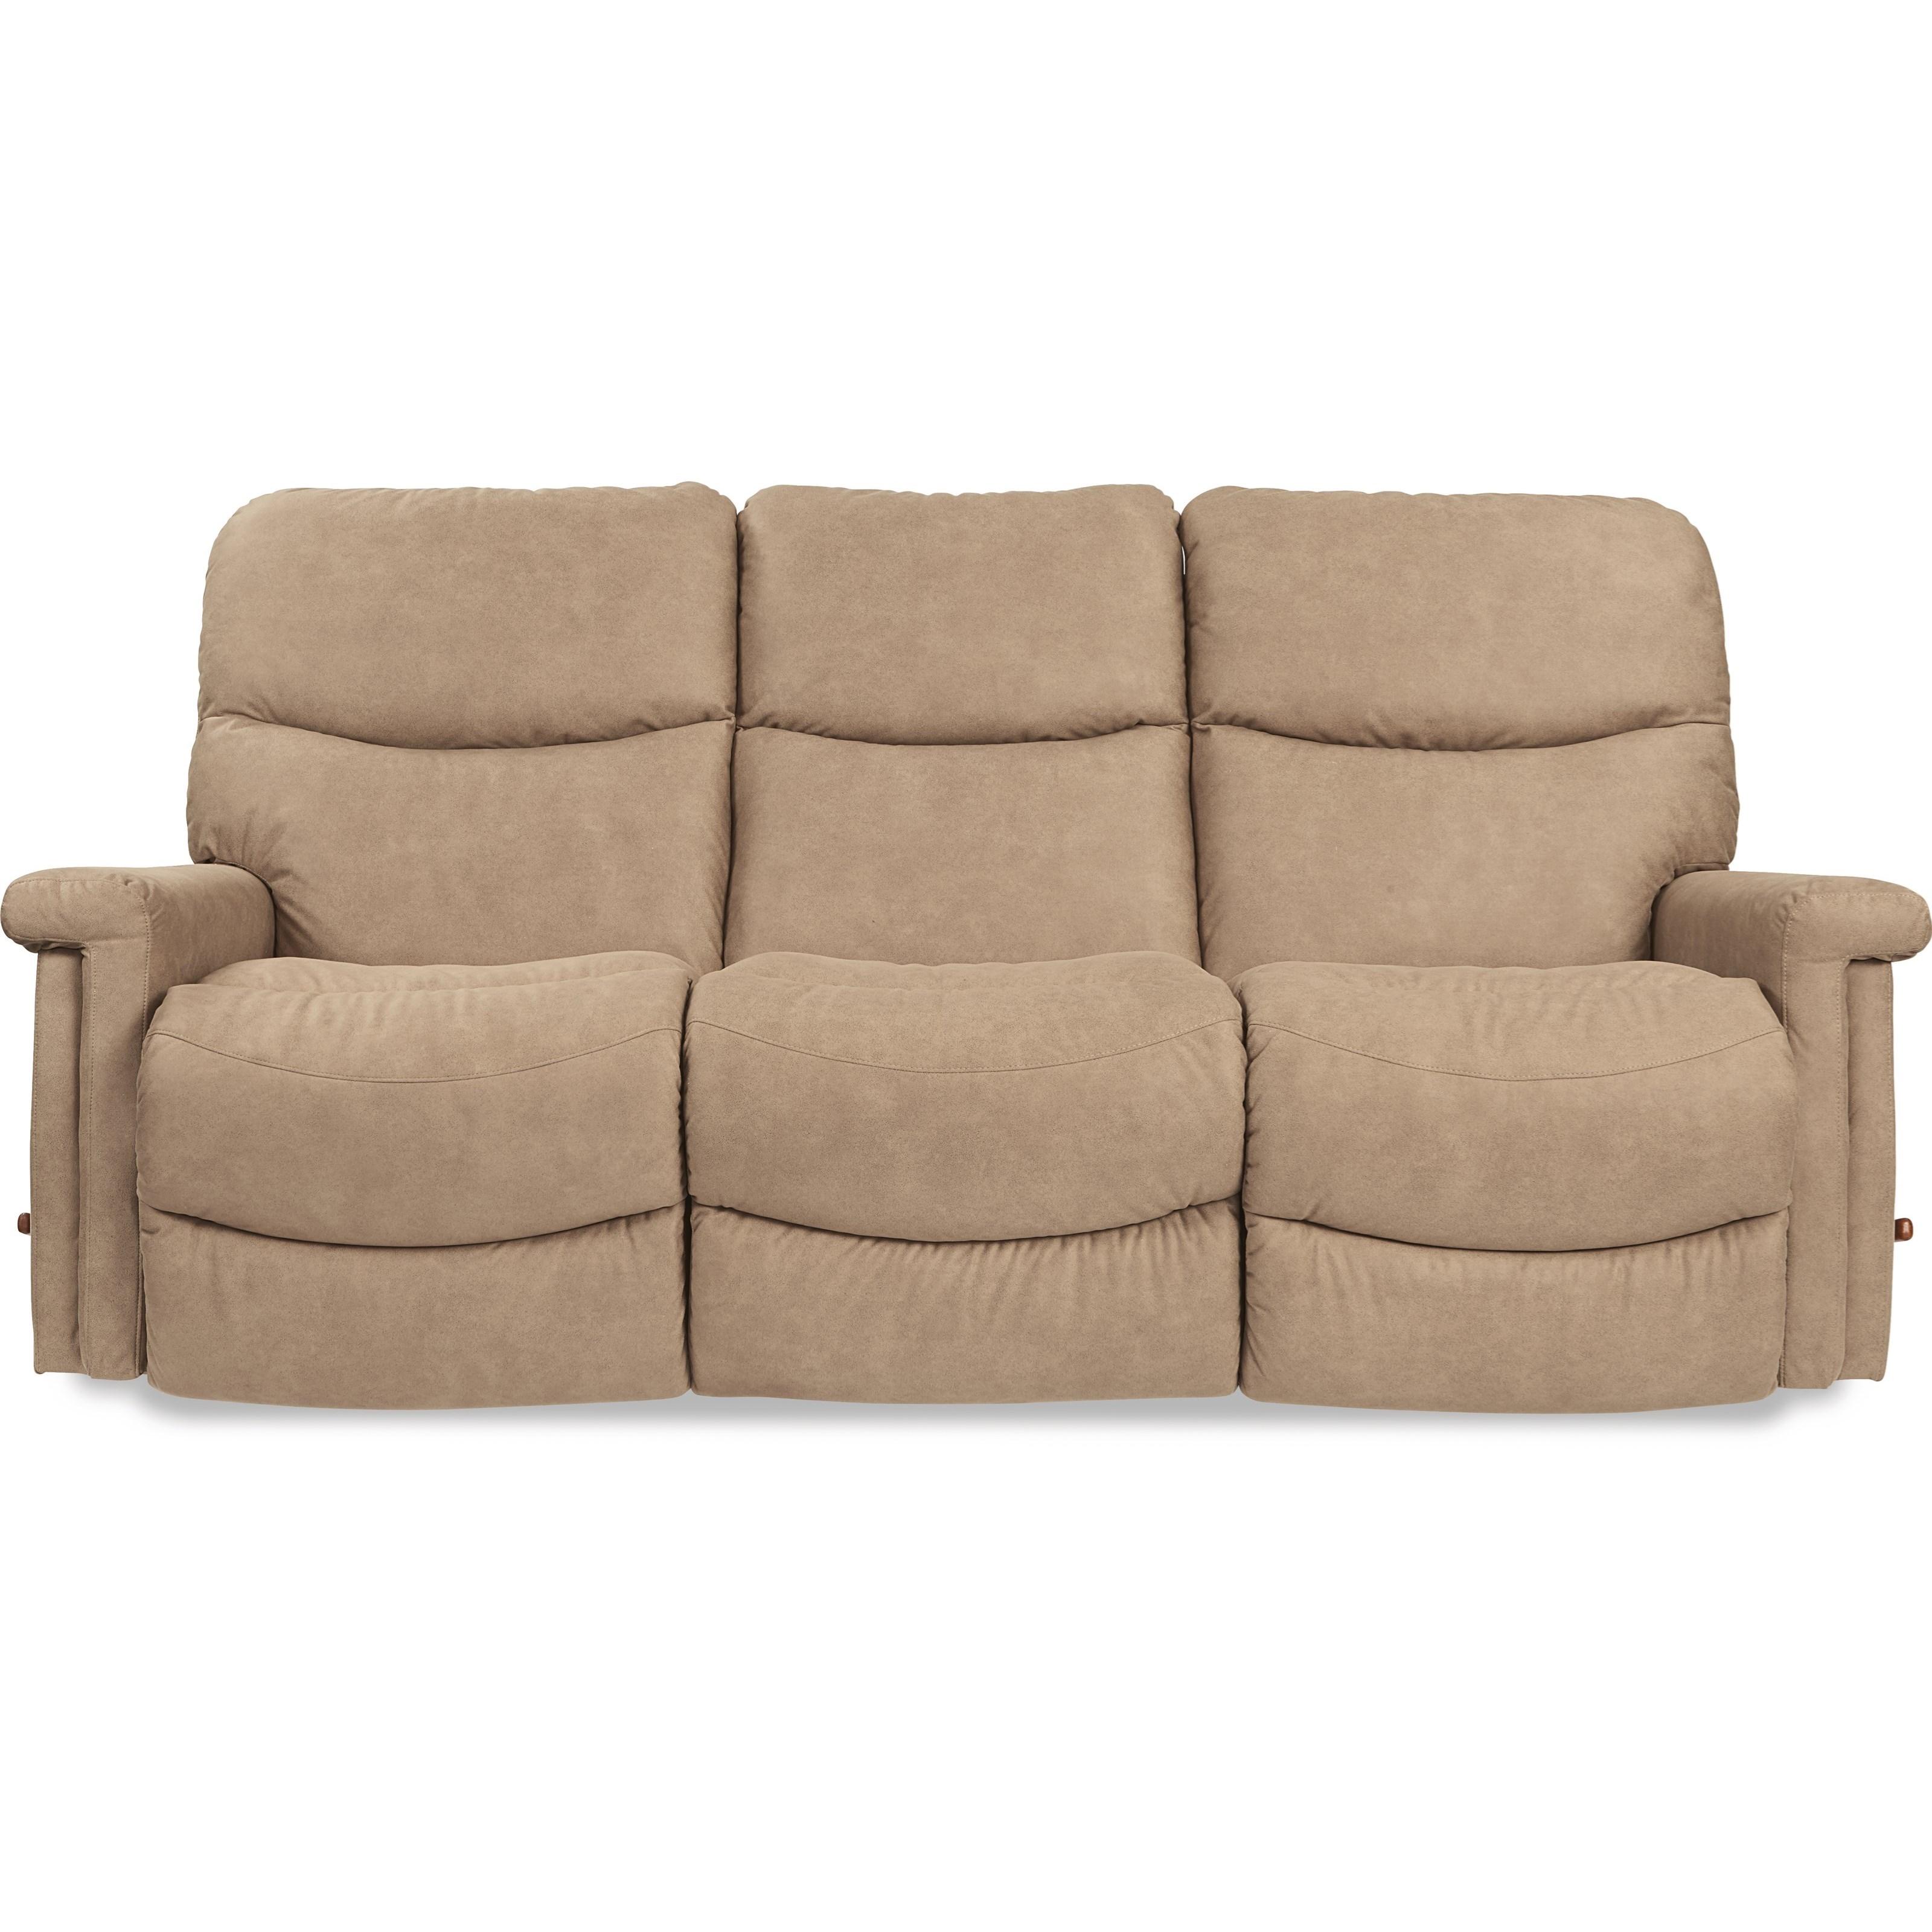 lane molly double reclining sofa goetz review wall saver sofas